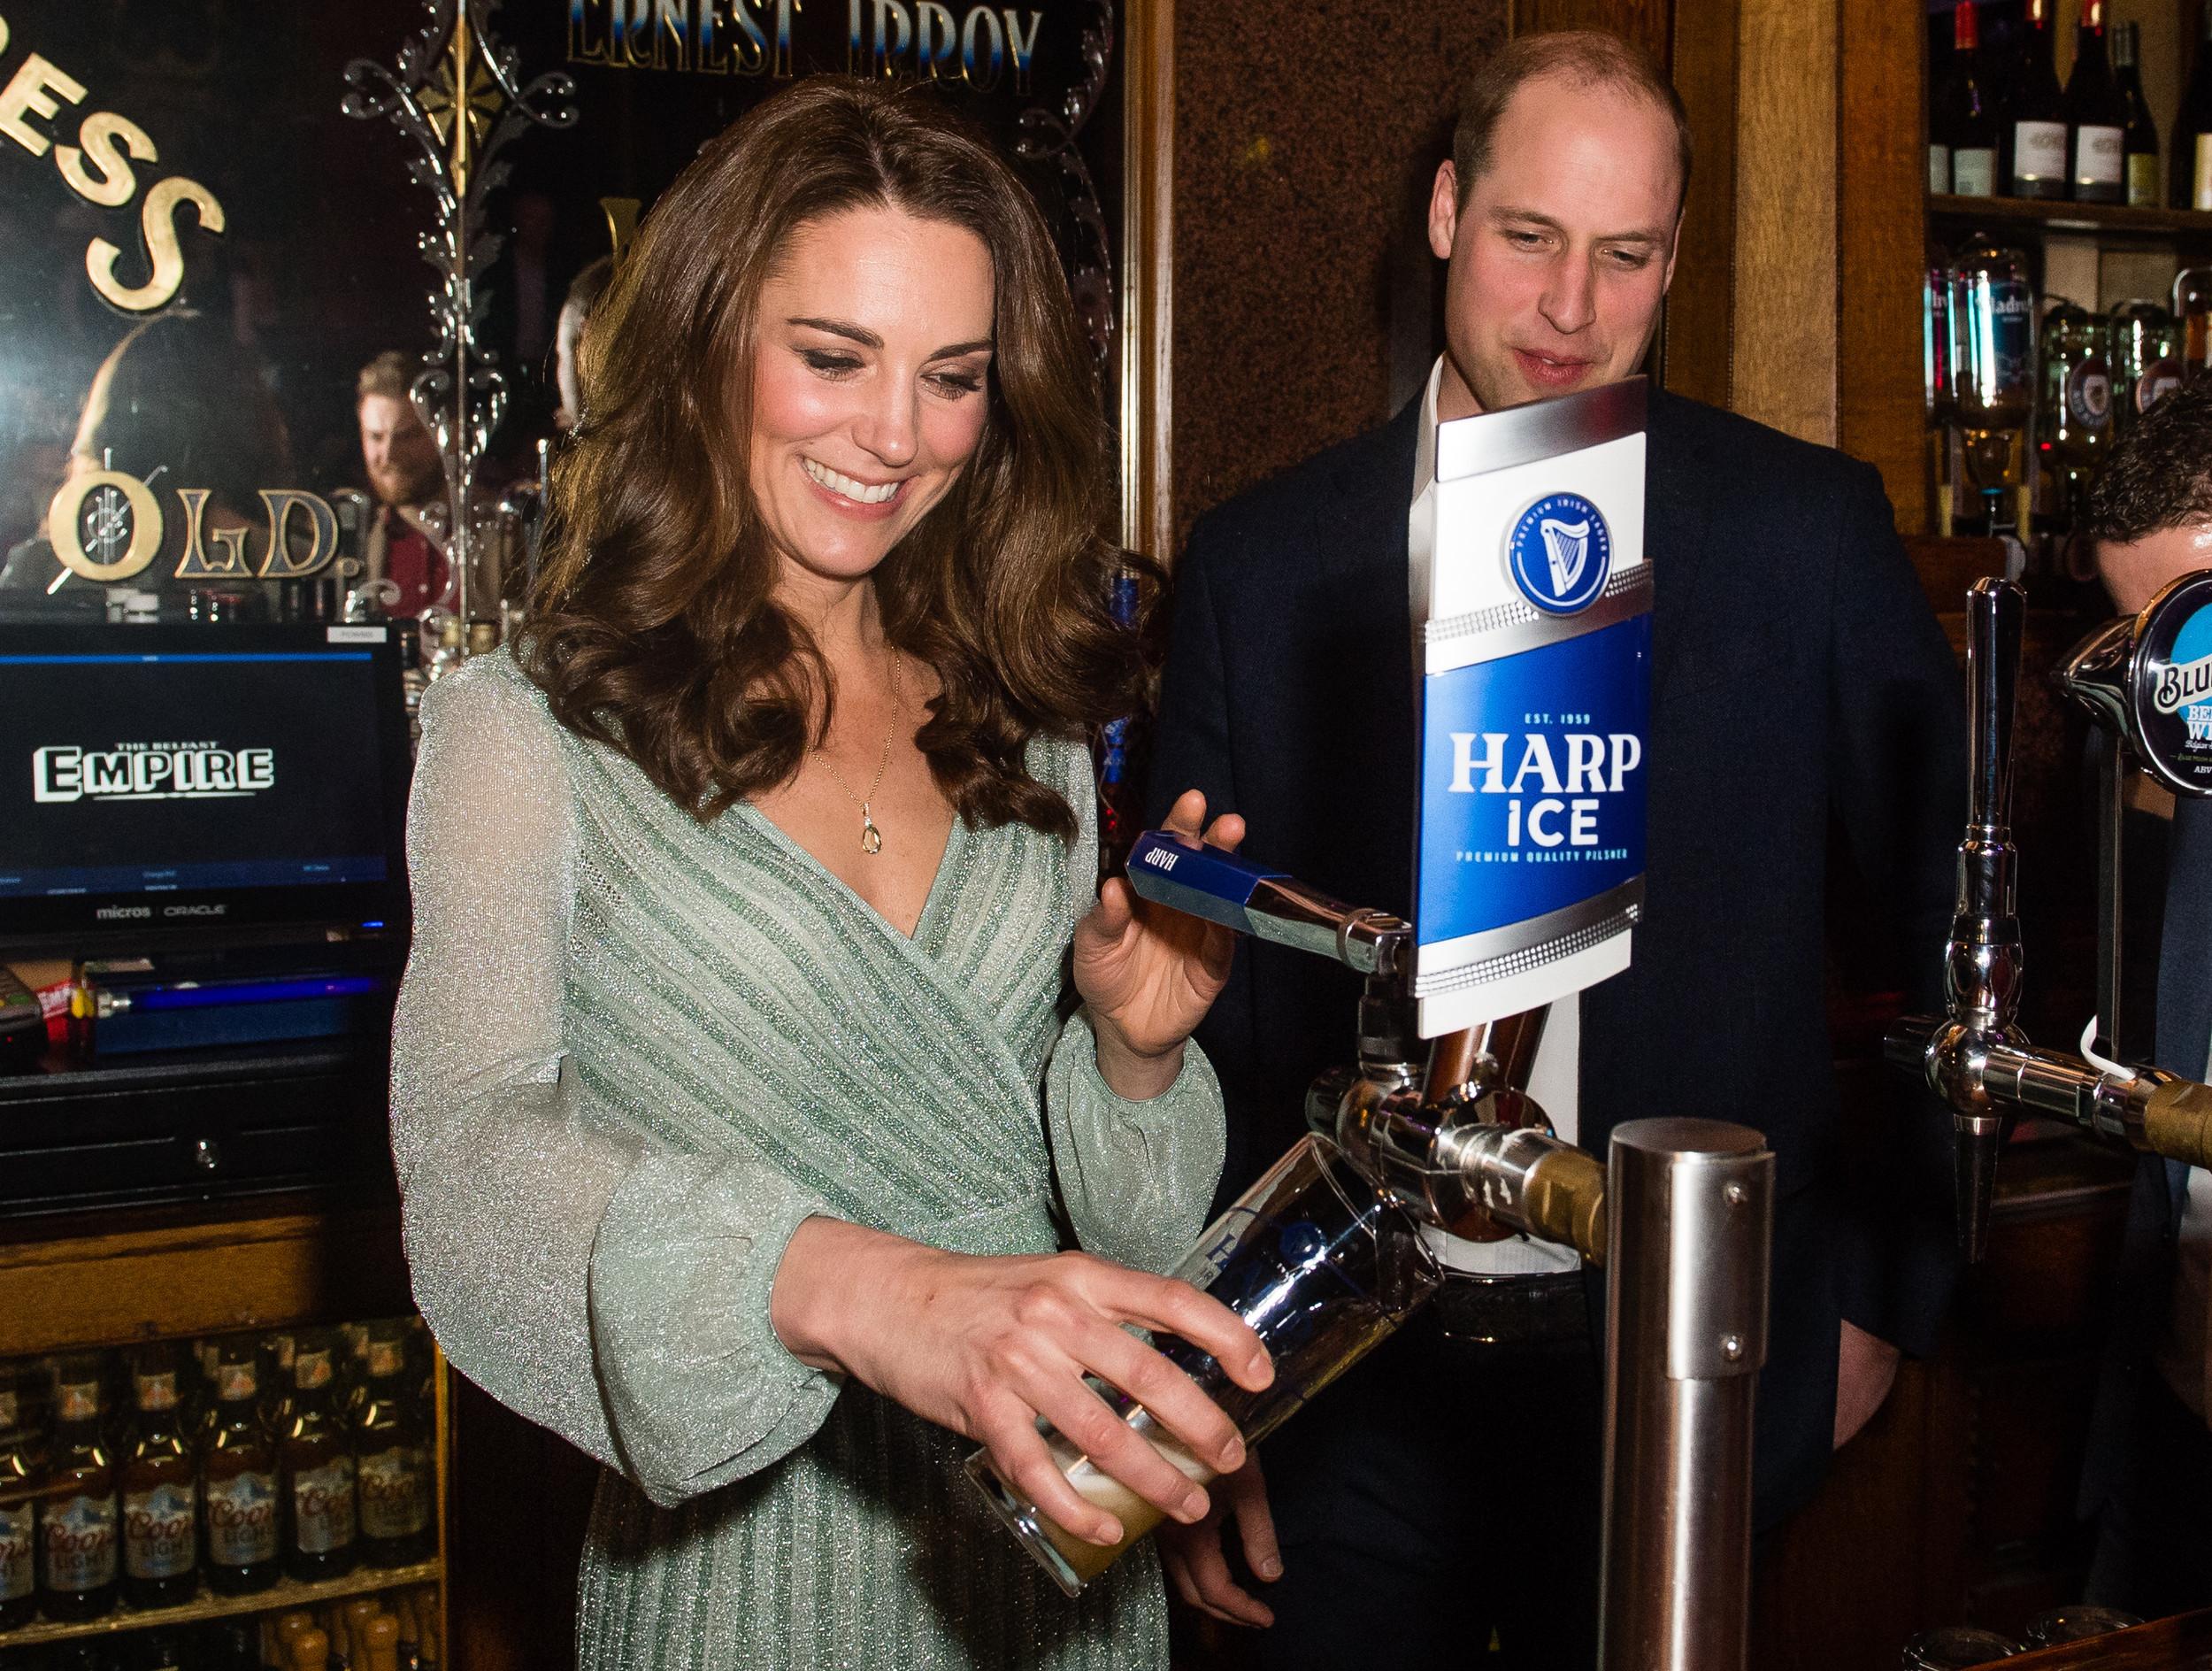 Kate Middleton Dresses Like a Disney Princess to Pour a Pint